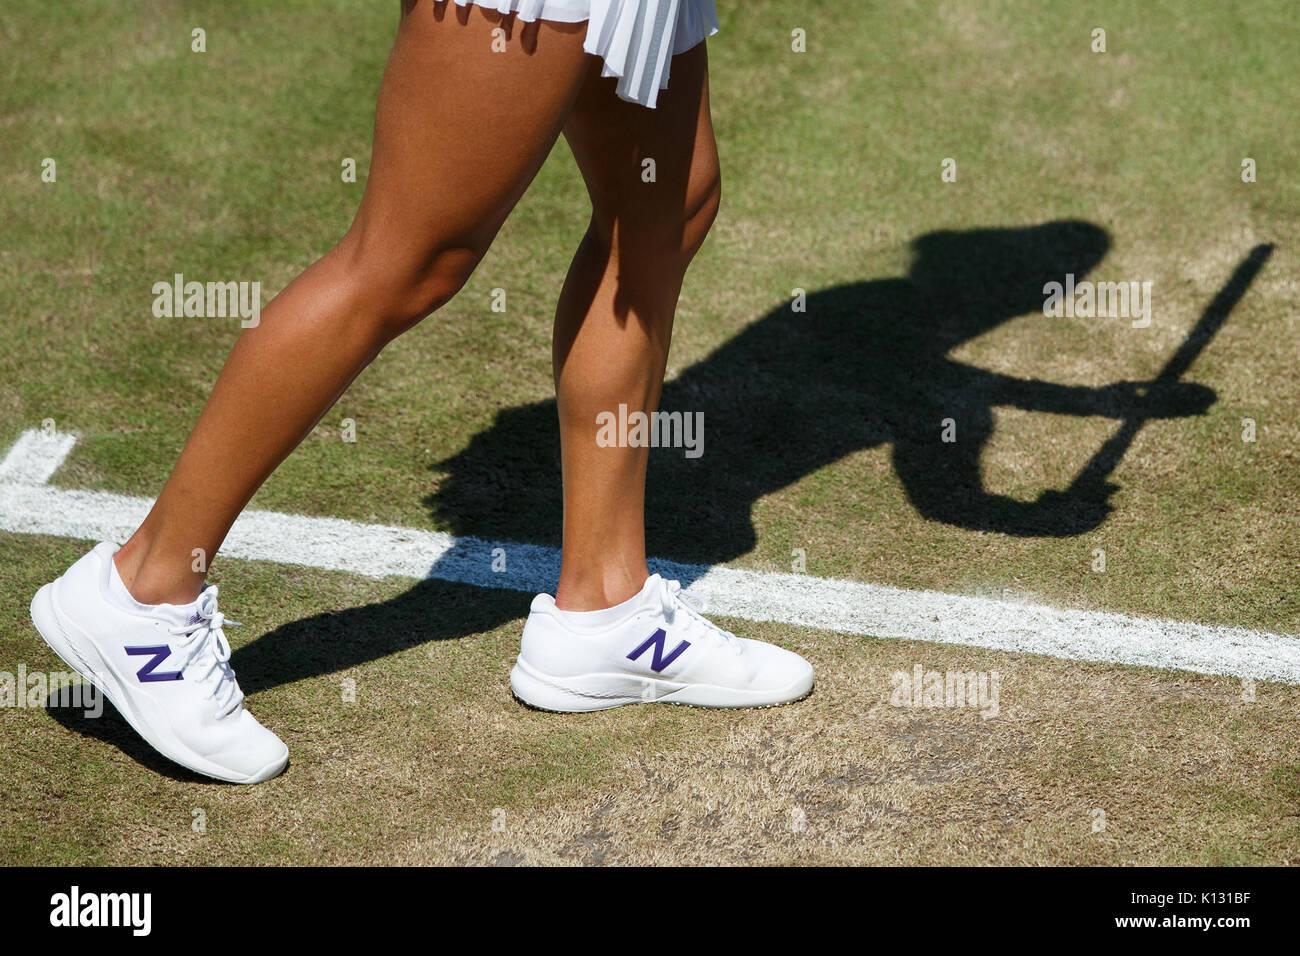 Generic tennis shadow of Heather Watson at the Ladies' Singles - Wimbledon Championships 2017 - Stock Image